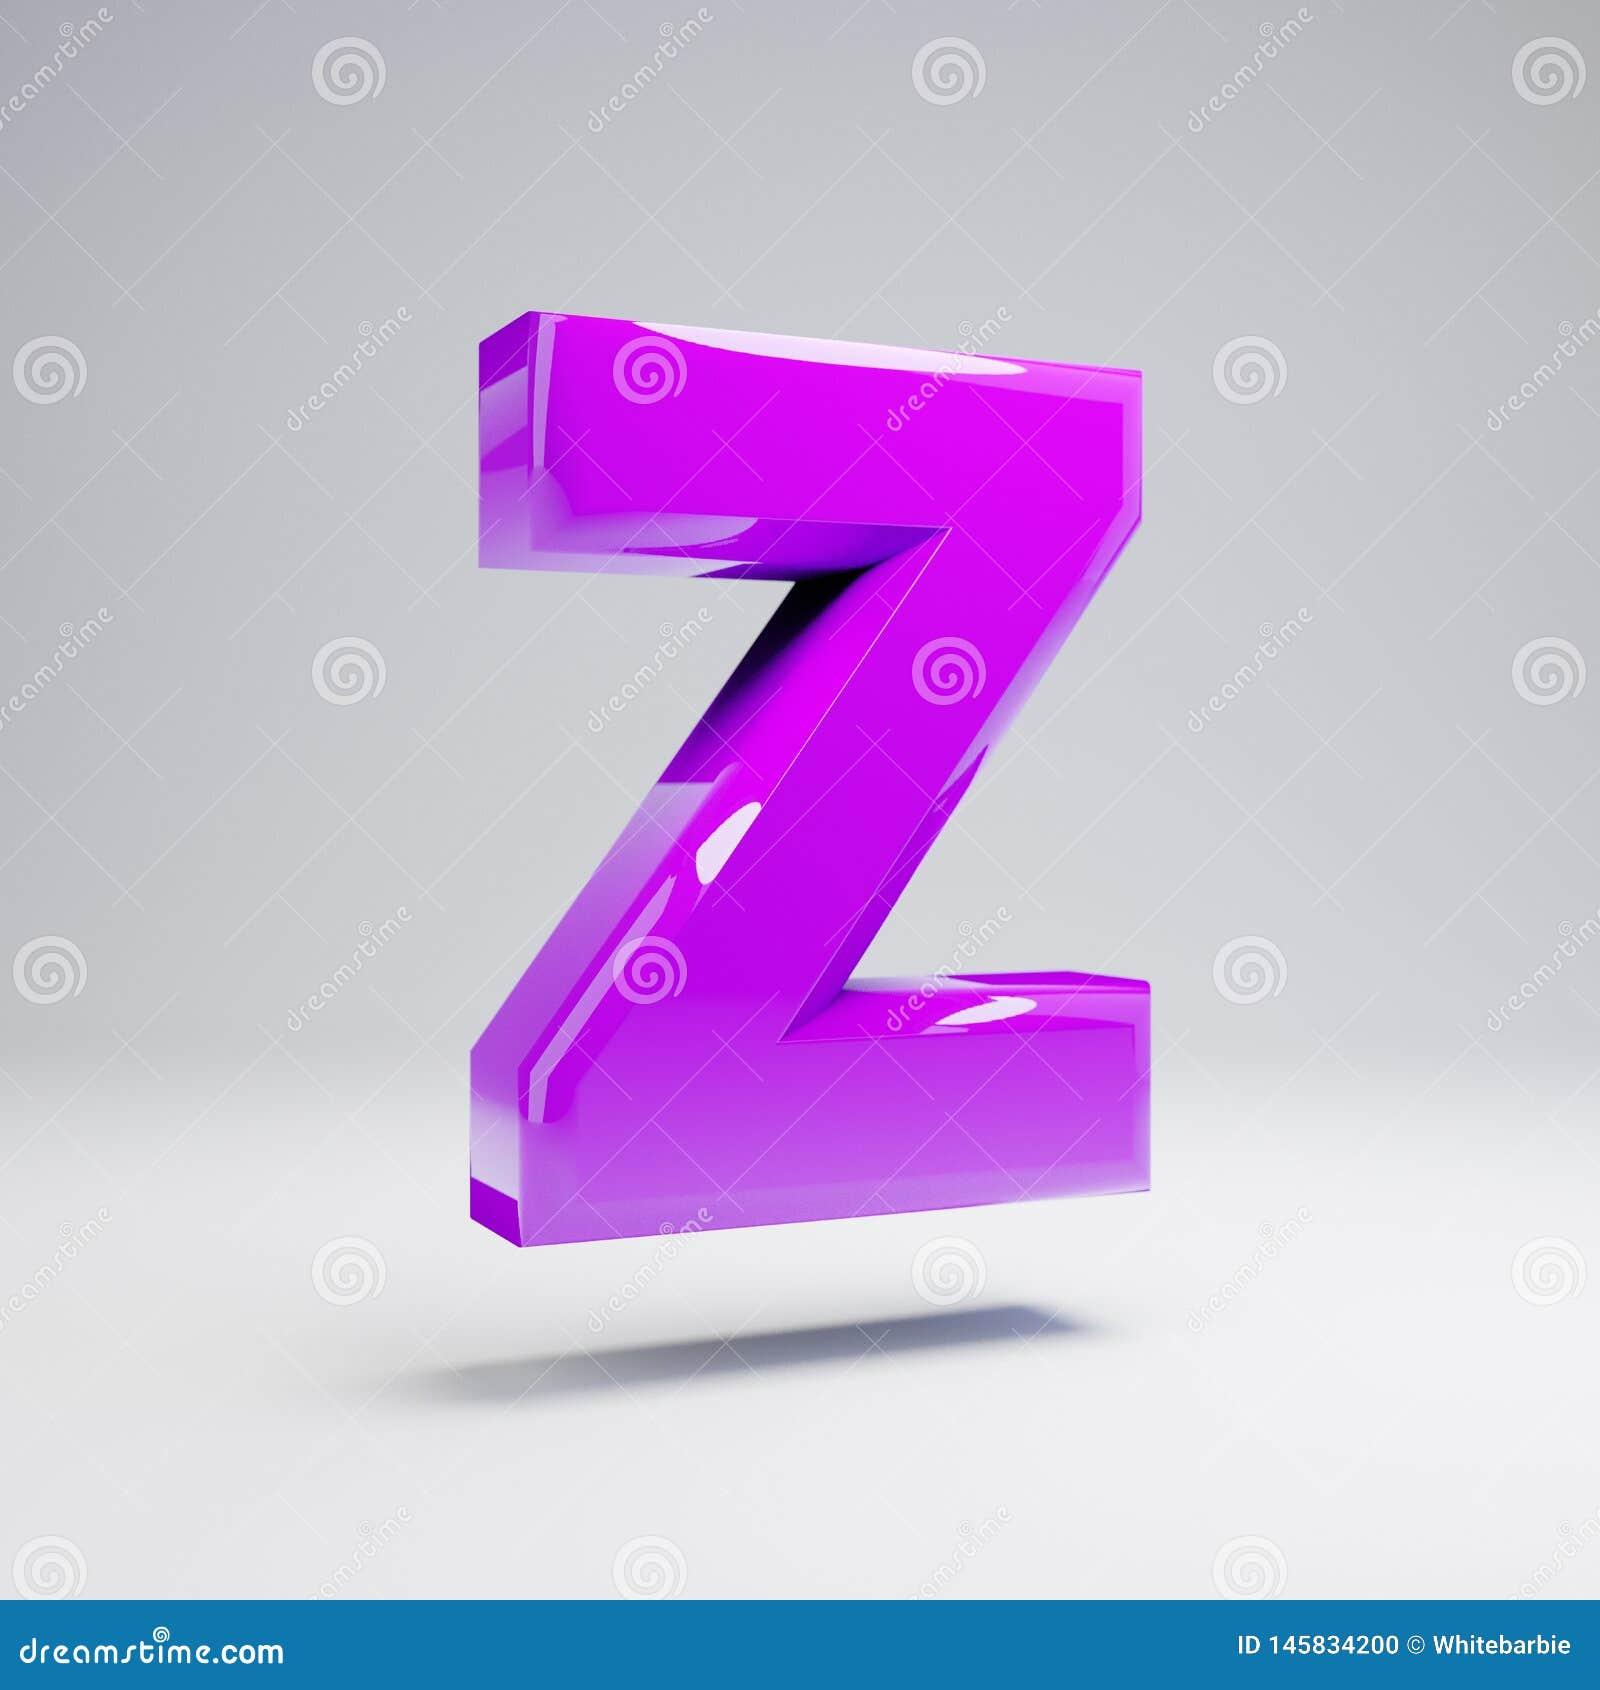 Volumetric glossy violet uppercase letter Z isolated on white background